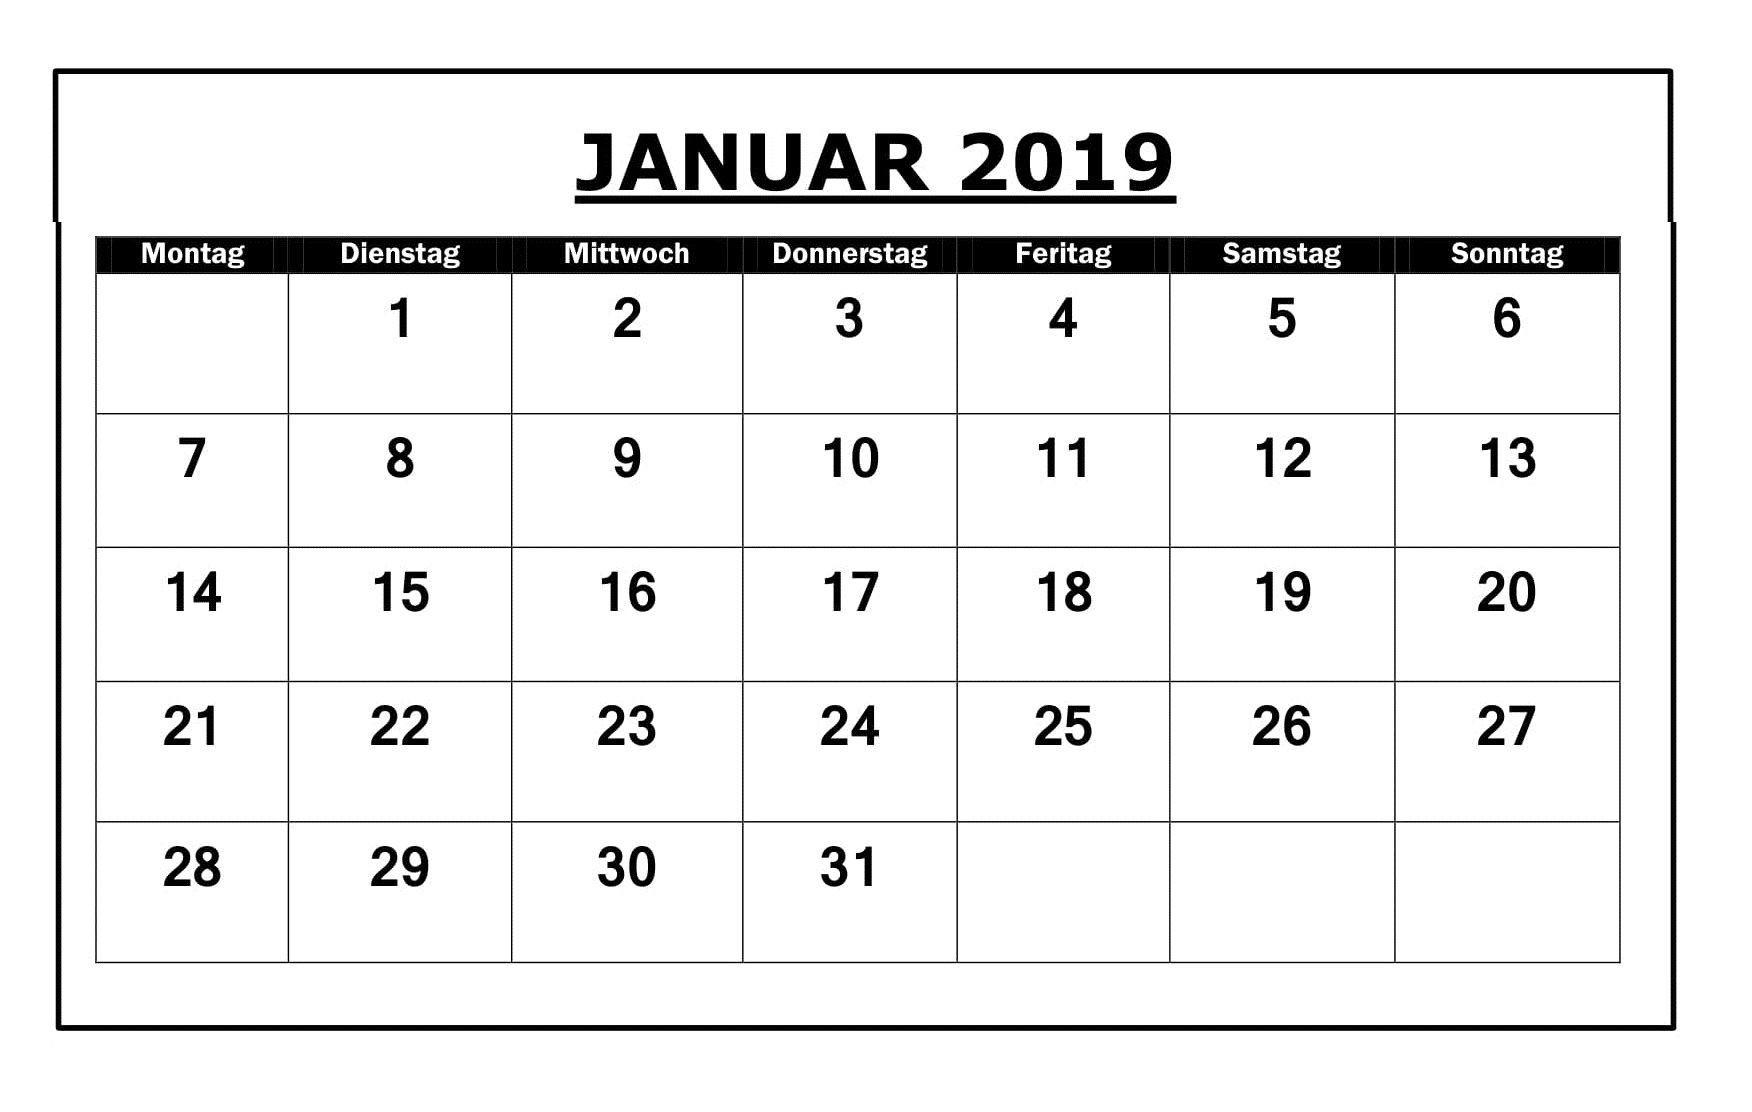 kalender monat januar 2019 zum ausdrucken kalender januar 2019 of kalender monat januar 2019 zum ausdrucken